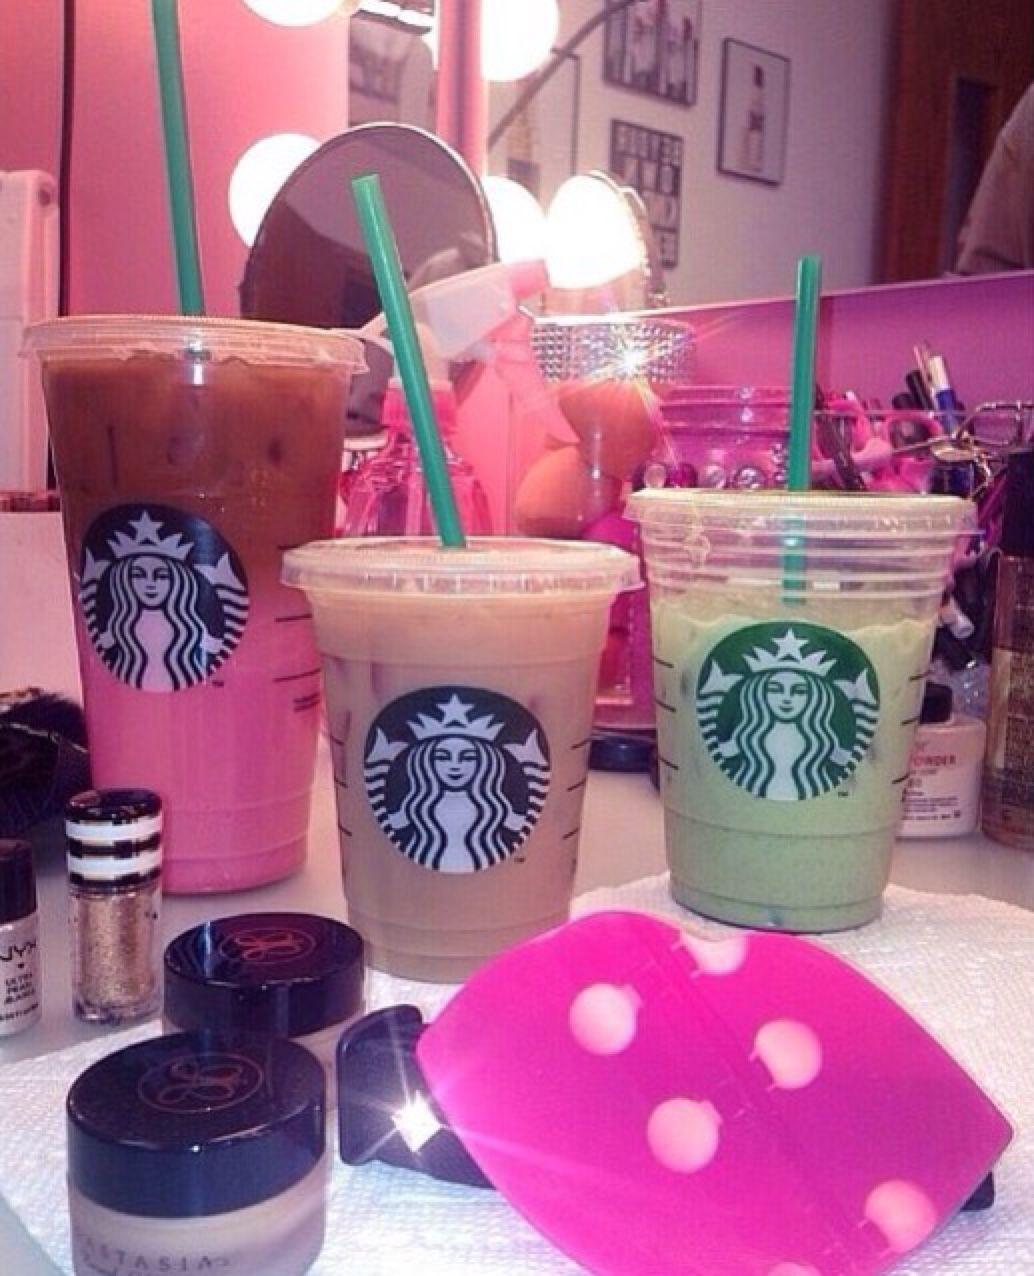 Colorful Starbucks Starbucks drinks, Starbucks coffee